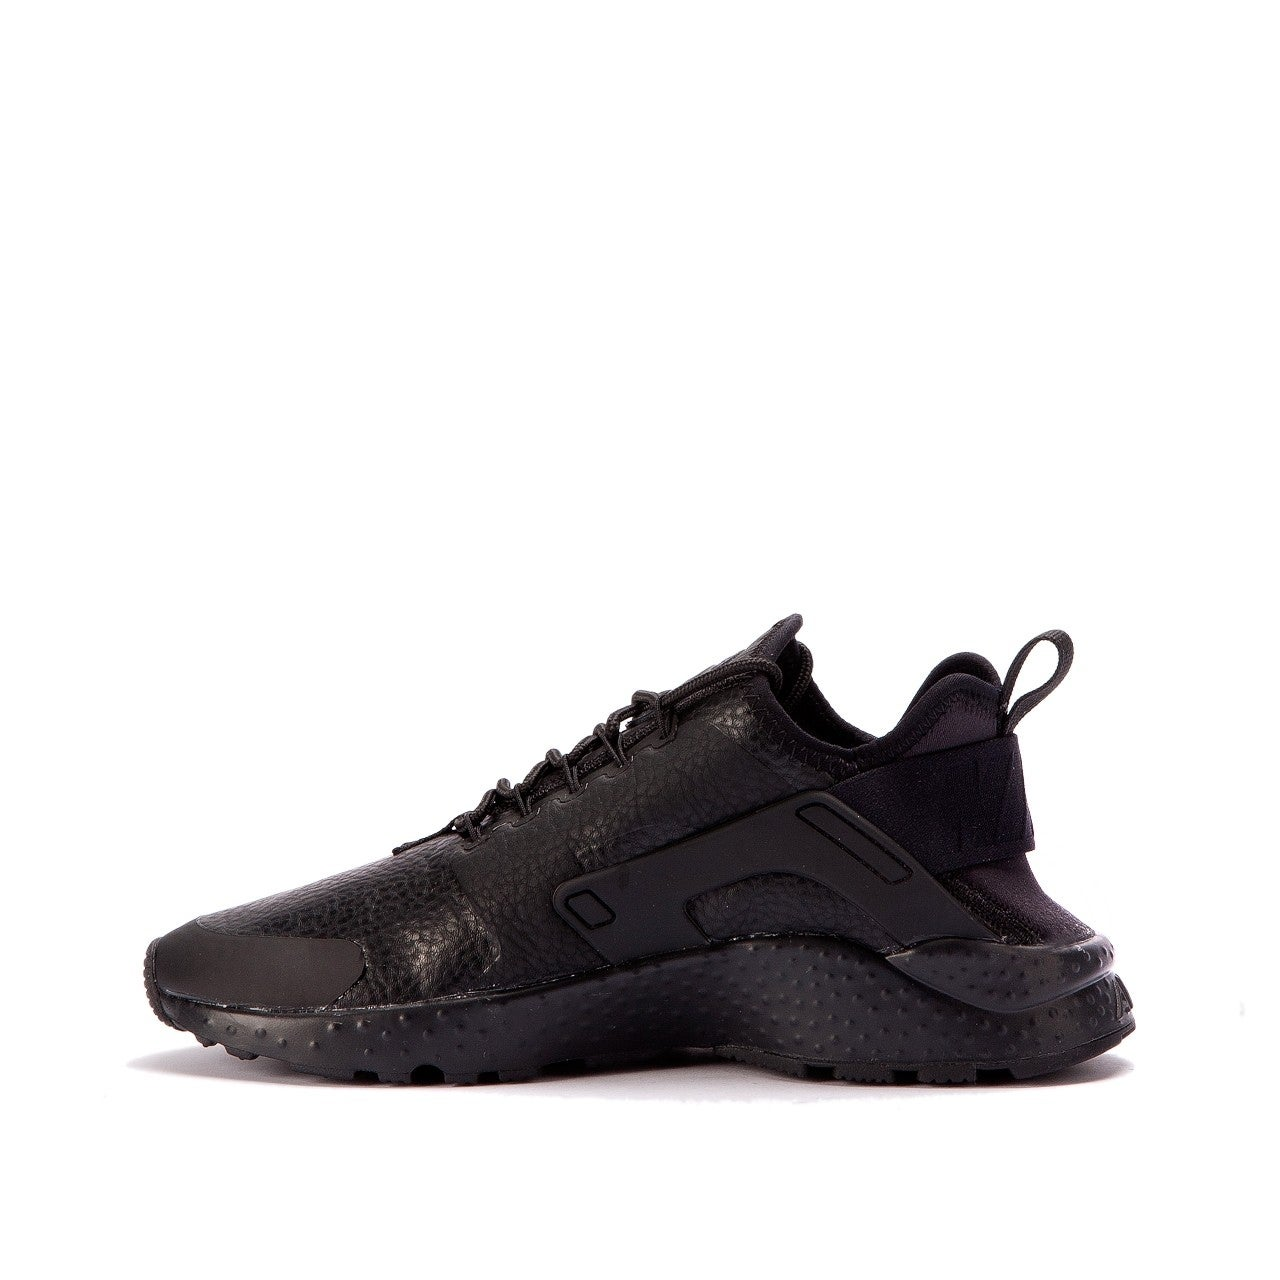 8e15b401c630 Shop Nike Womens Air Huarache Run Ultra Prm Low Top Lace Up Running Sneaker  - 7.5 - Free Shipping Today - Overstock - 25774242